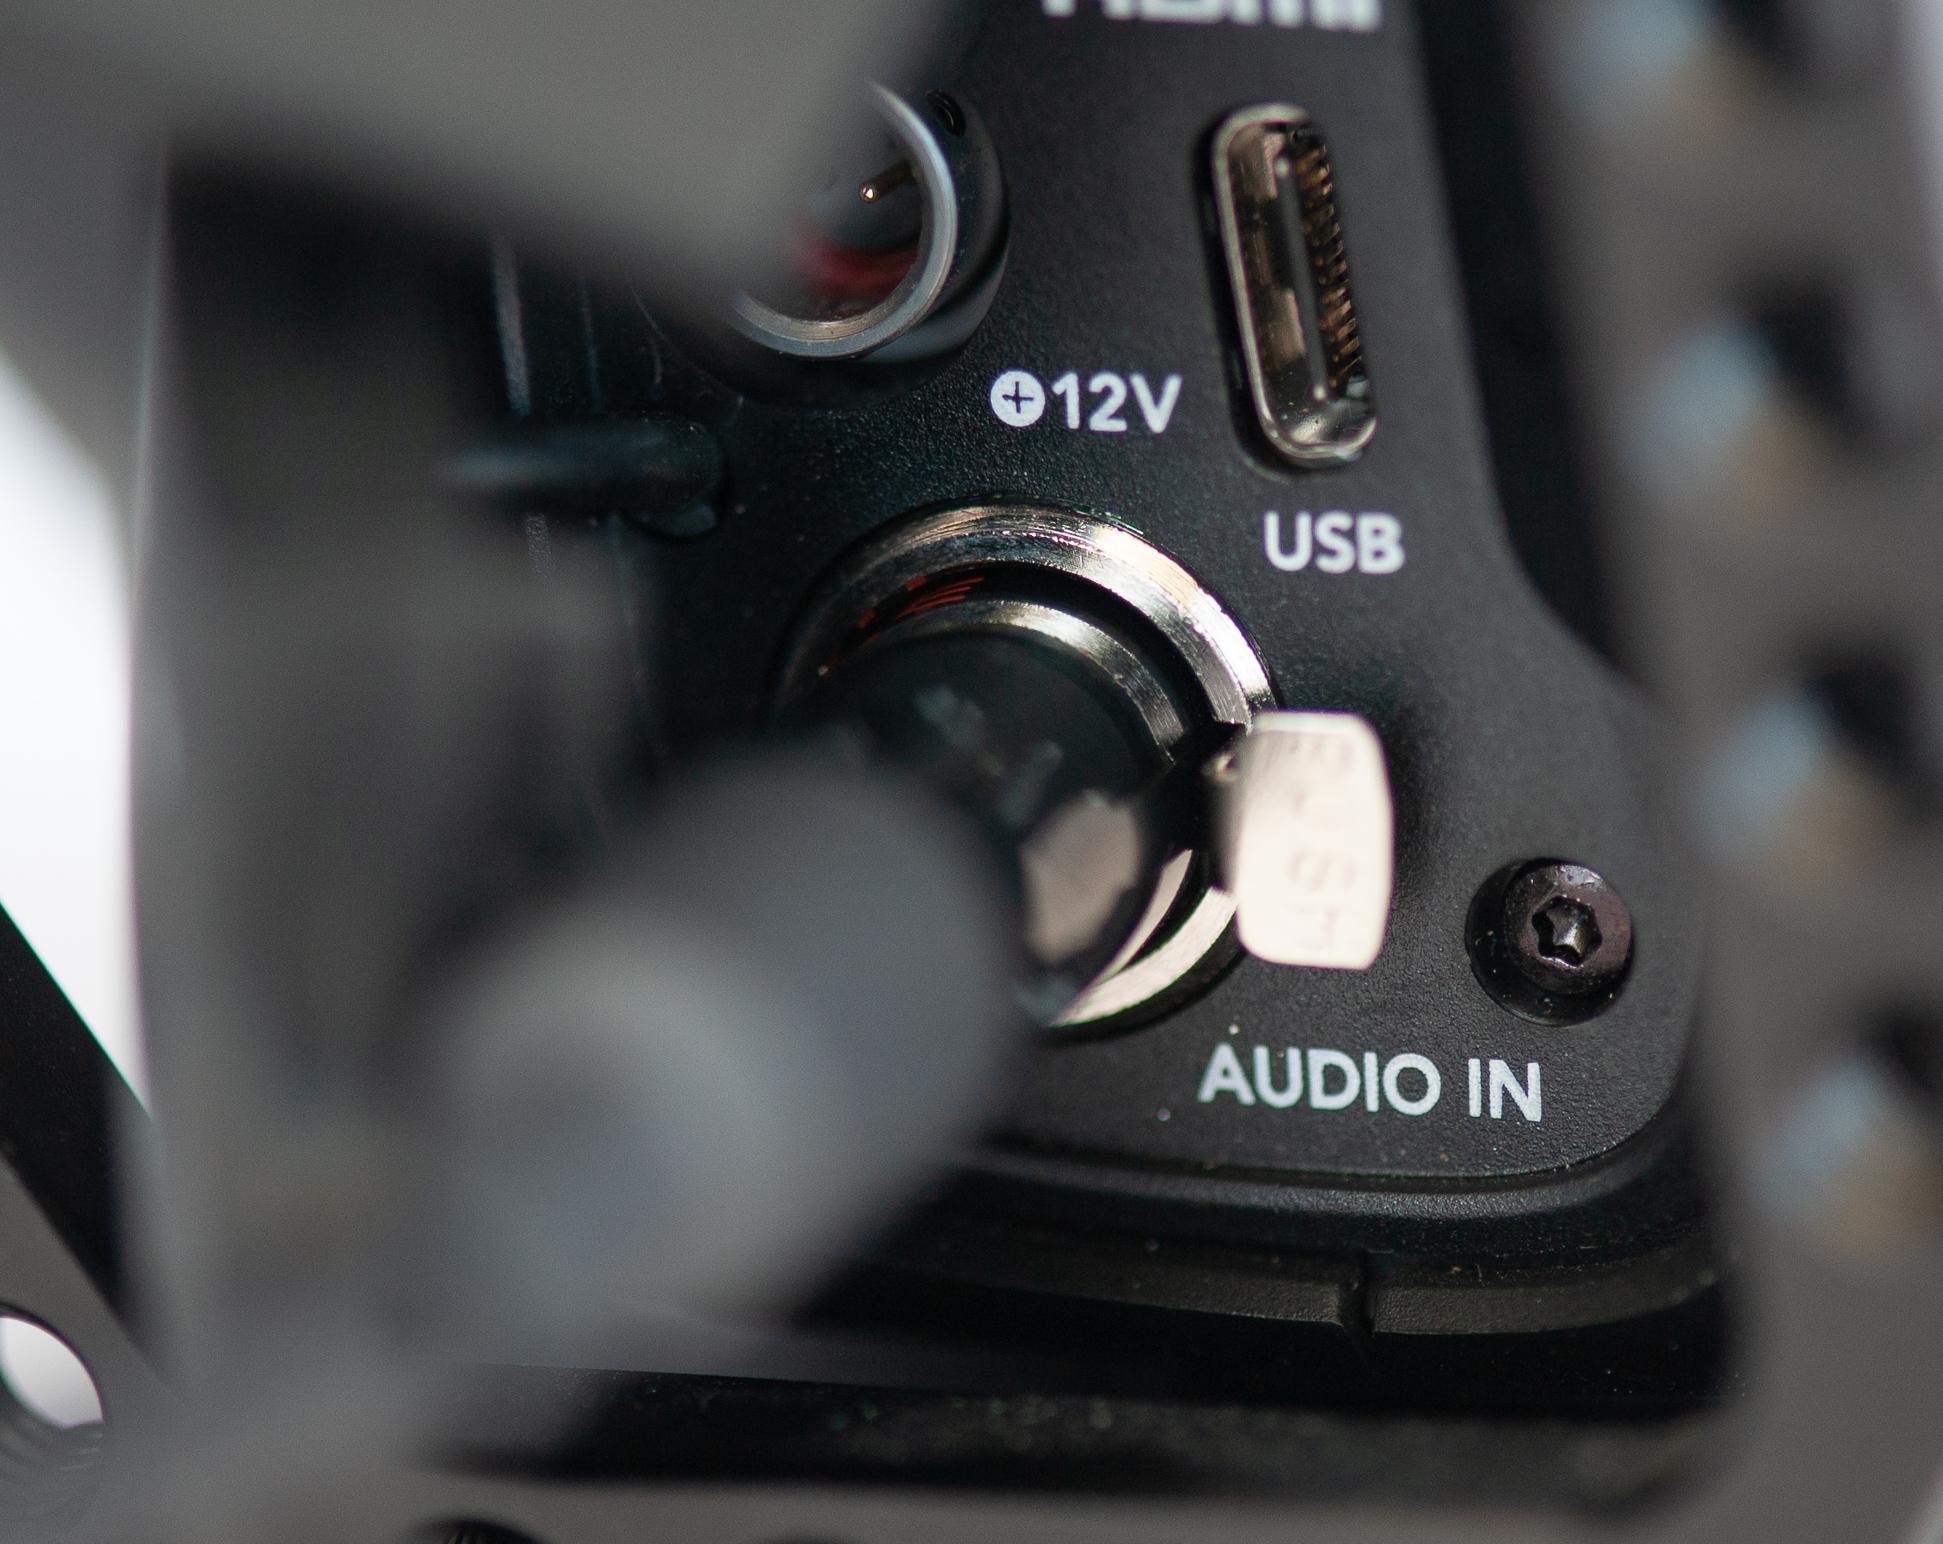 A Better Xlr Mini Adapter For The Blackmagic Pocket Cinema Camera 4k